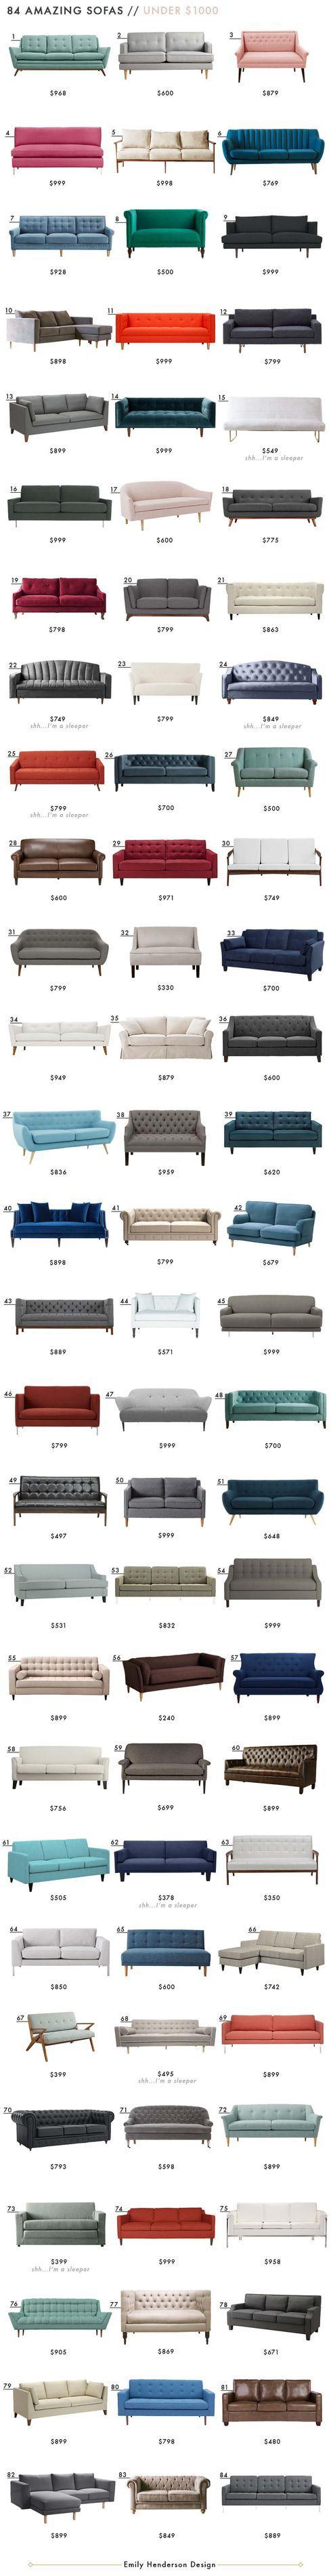 84 Affordable Amazing Sofas Under $1000